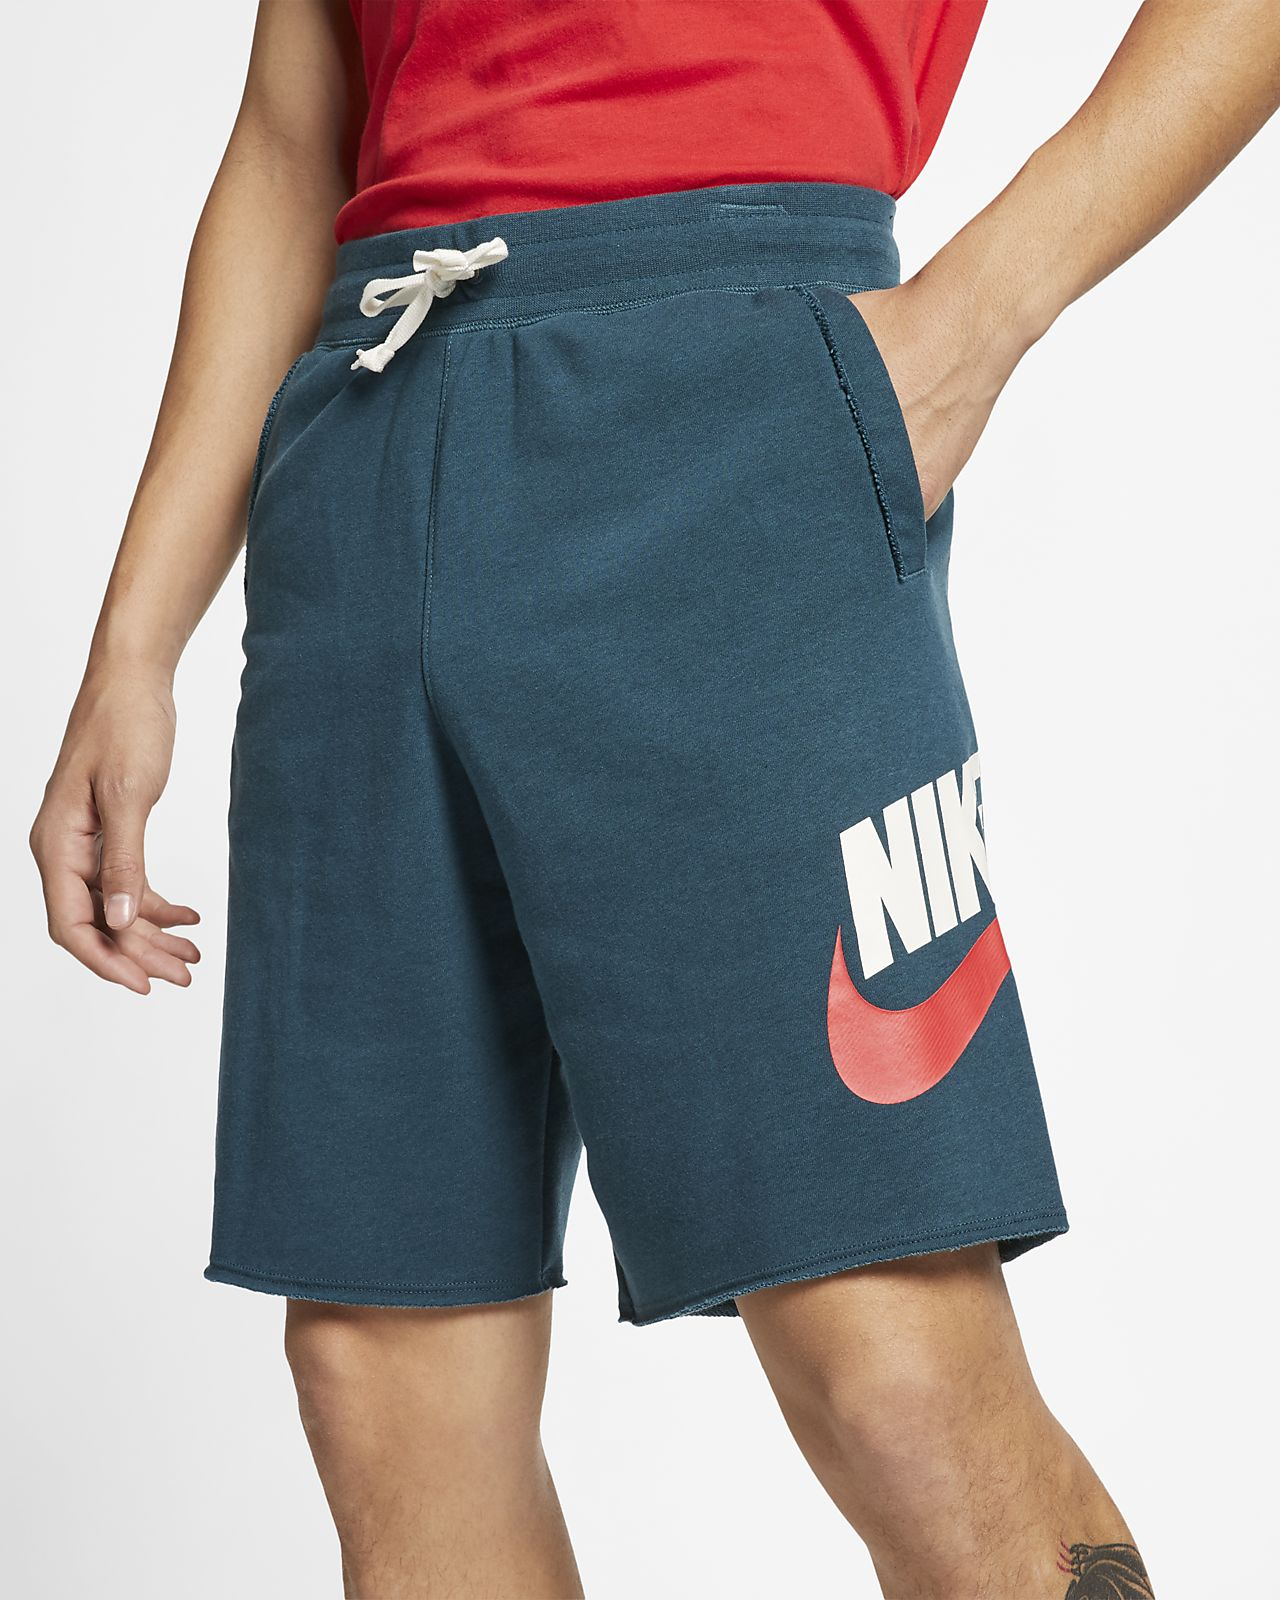 Nike Pour Pour Nike Short Sportswear Sportswear Short Homme PmyNnOw8v0